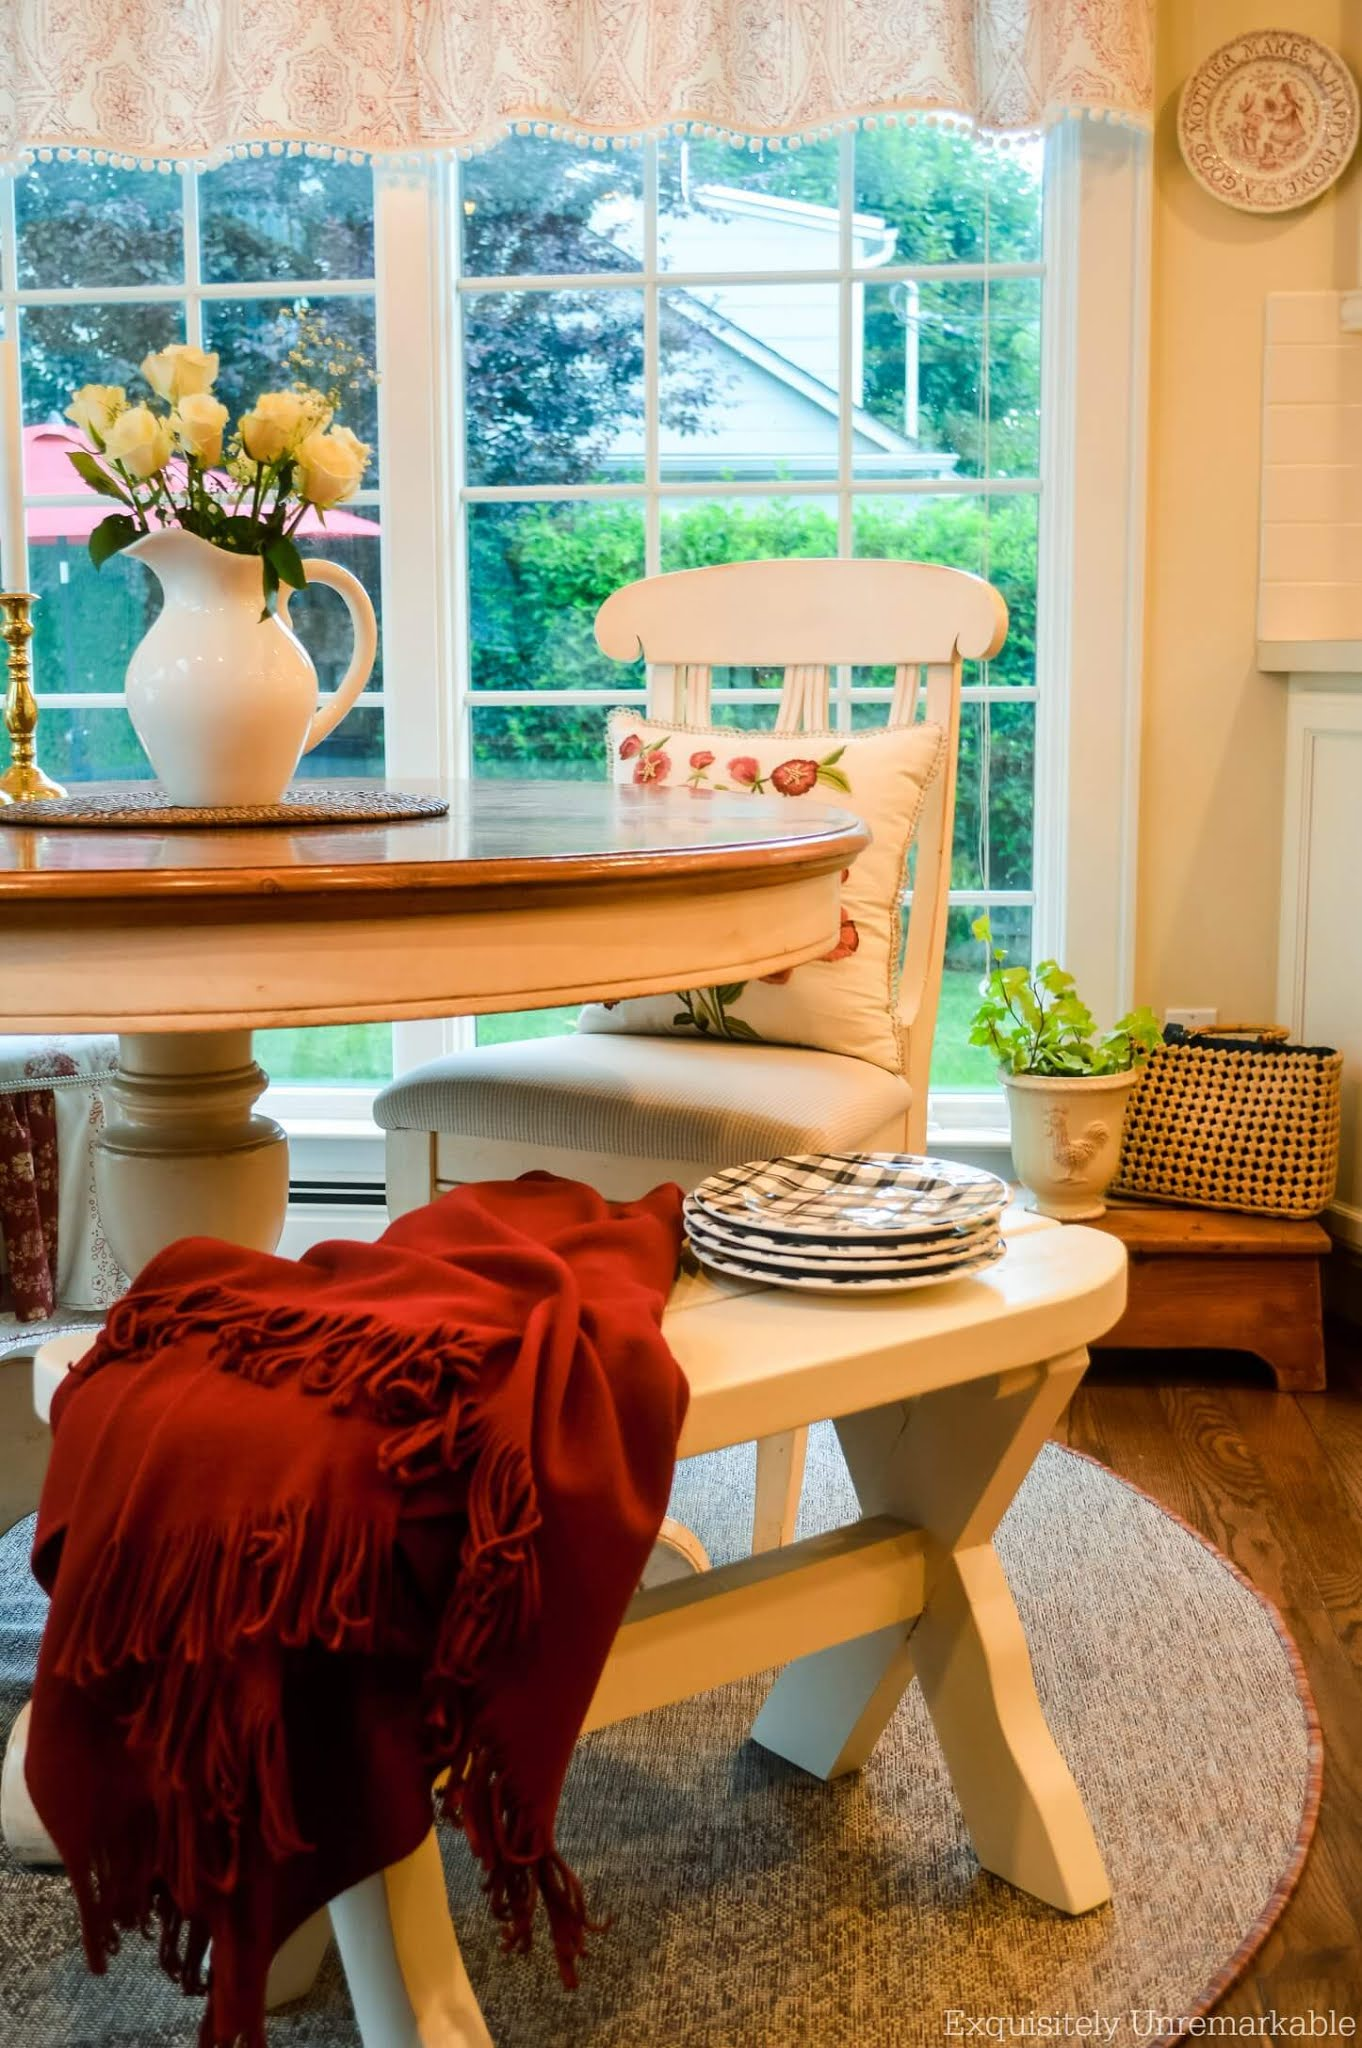 Cozy Cottage Kitchen Nook Exquisitely Unremarkable